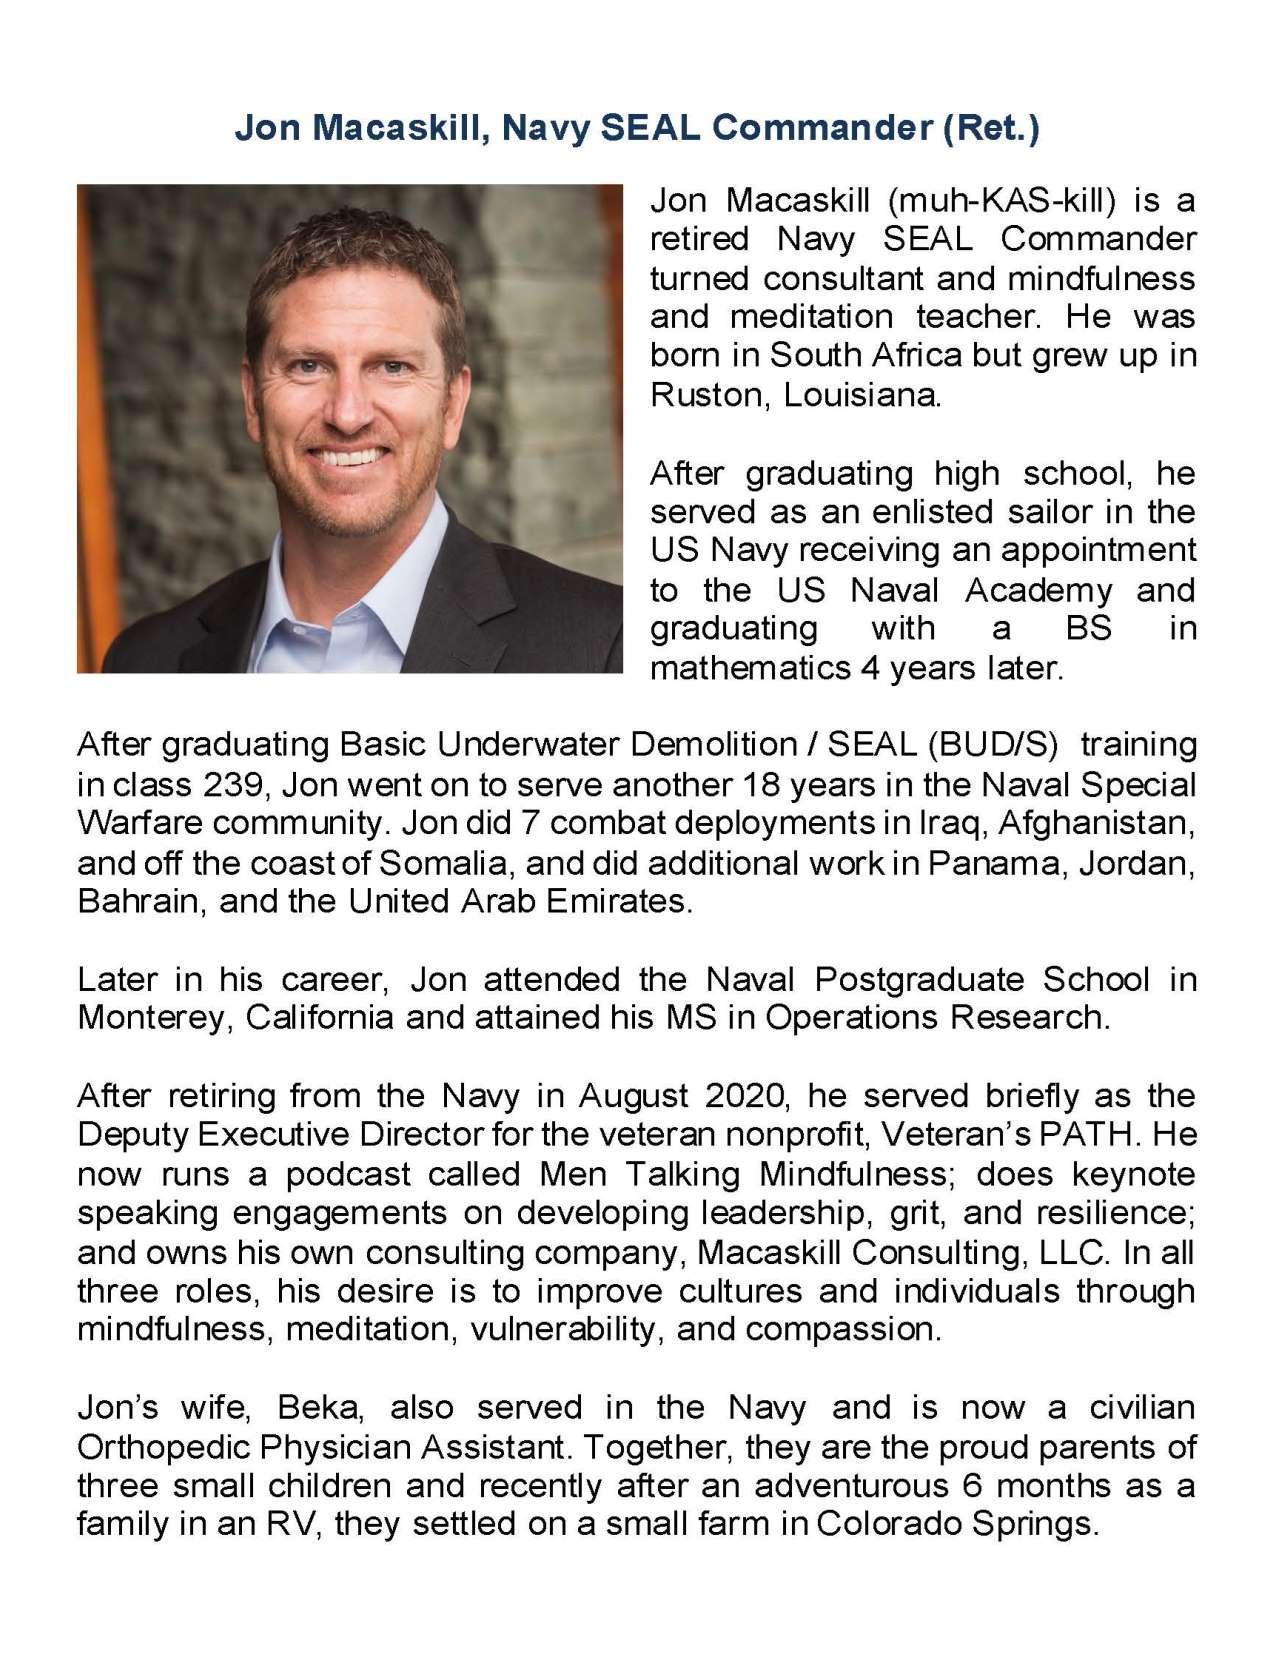 John Macaskill - Biography - updated 9-21